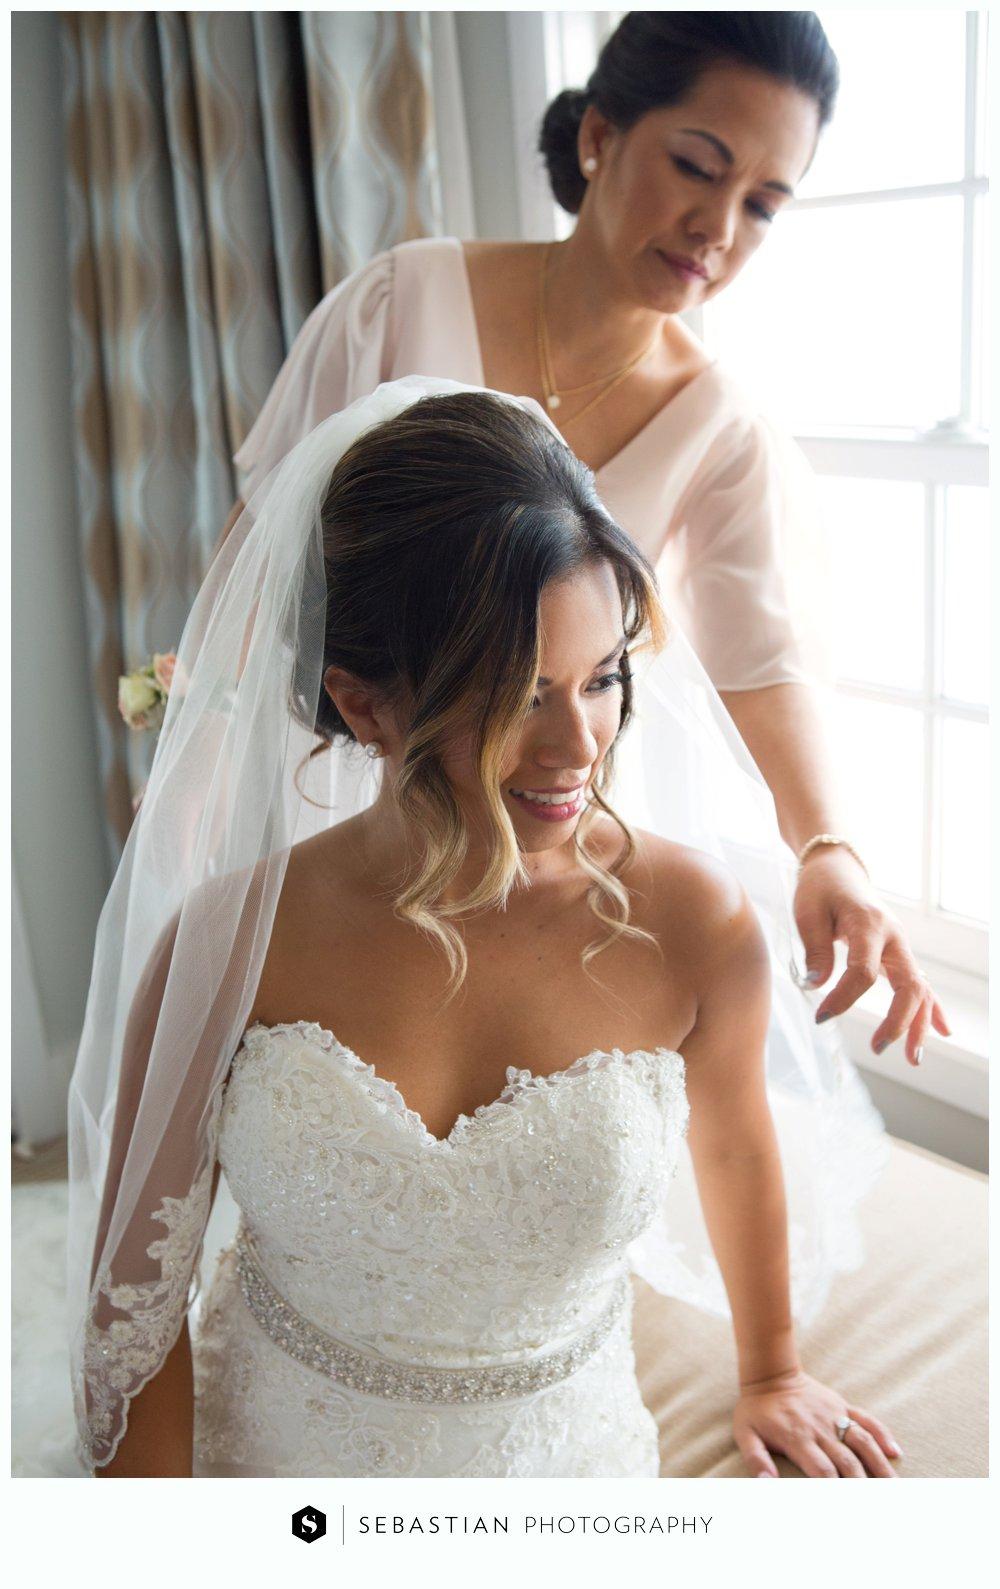 Sebastian Photography_CT Wedding Photographer_Water's Edge Wedding_1017.jpg